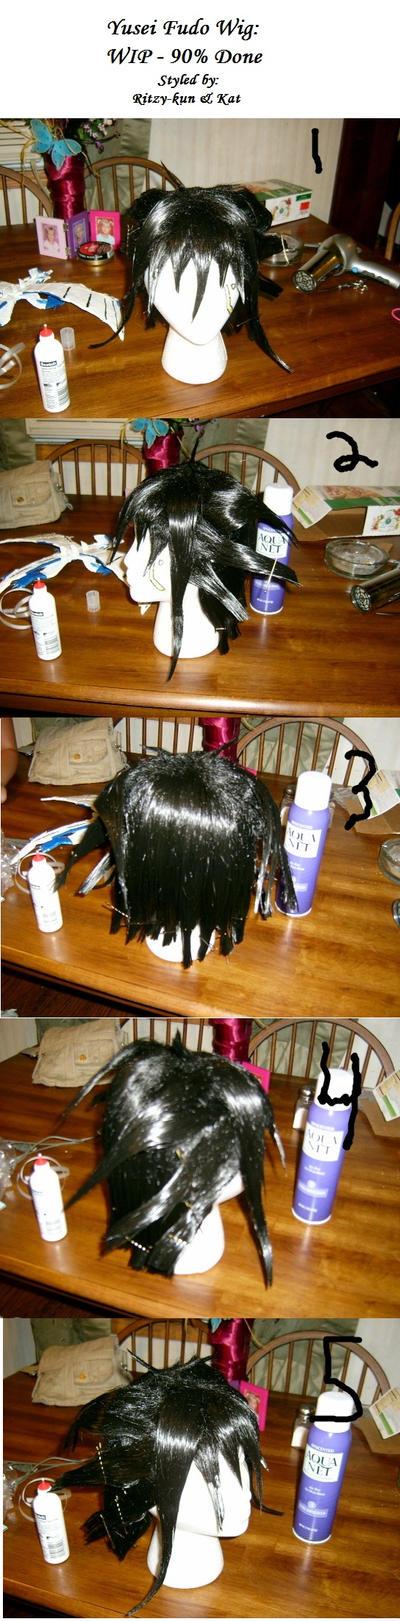 Yusei wig progress: 90 percent by Ritzy-kun